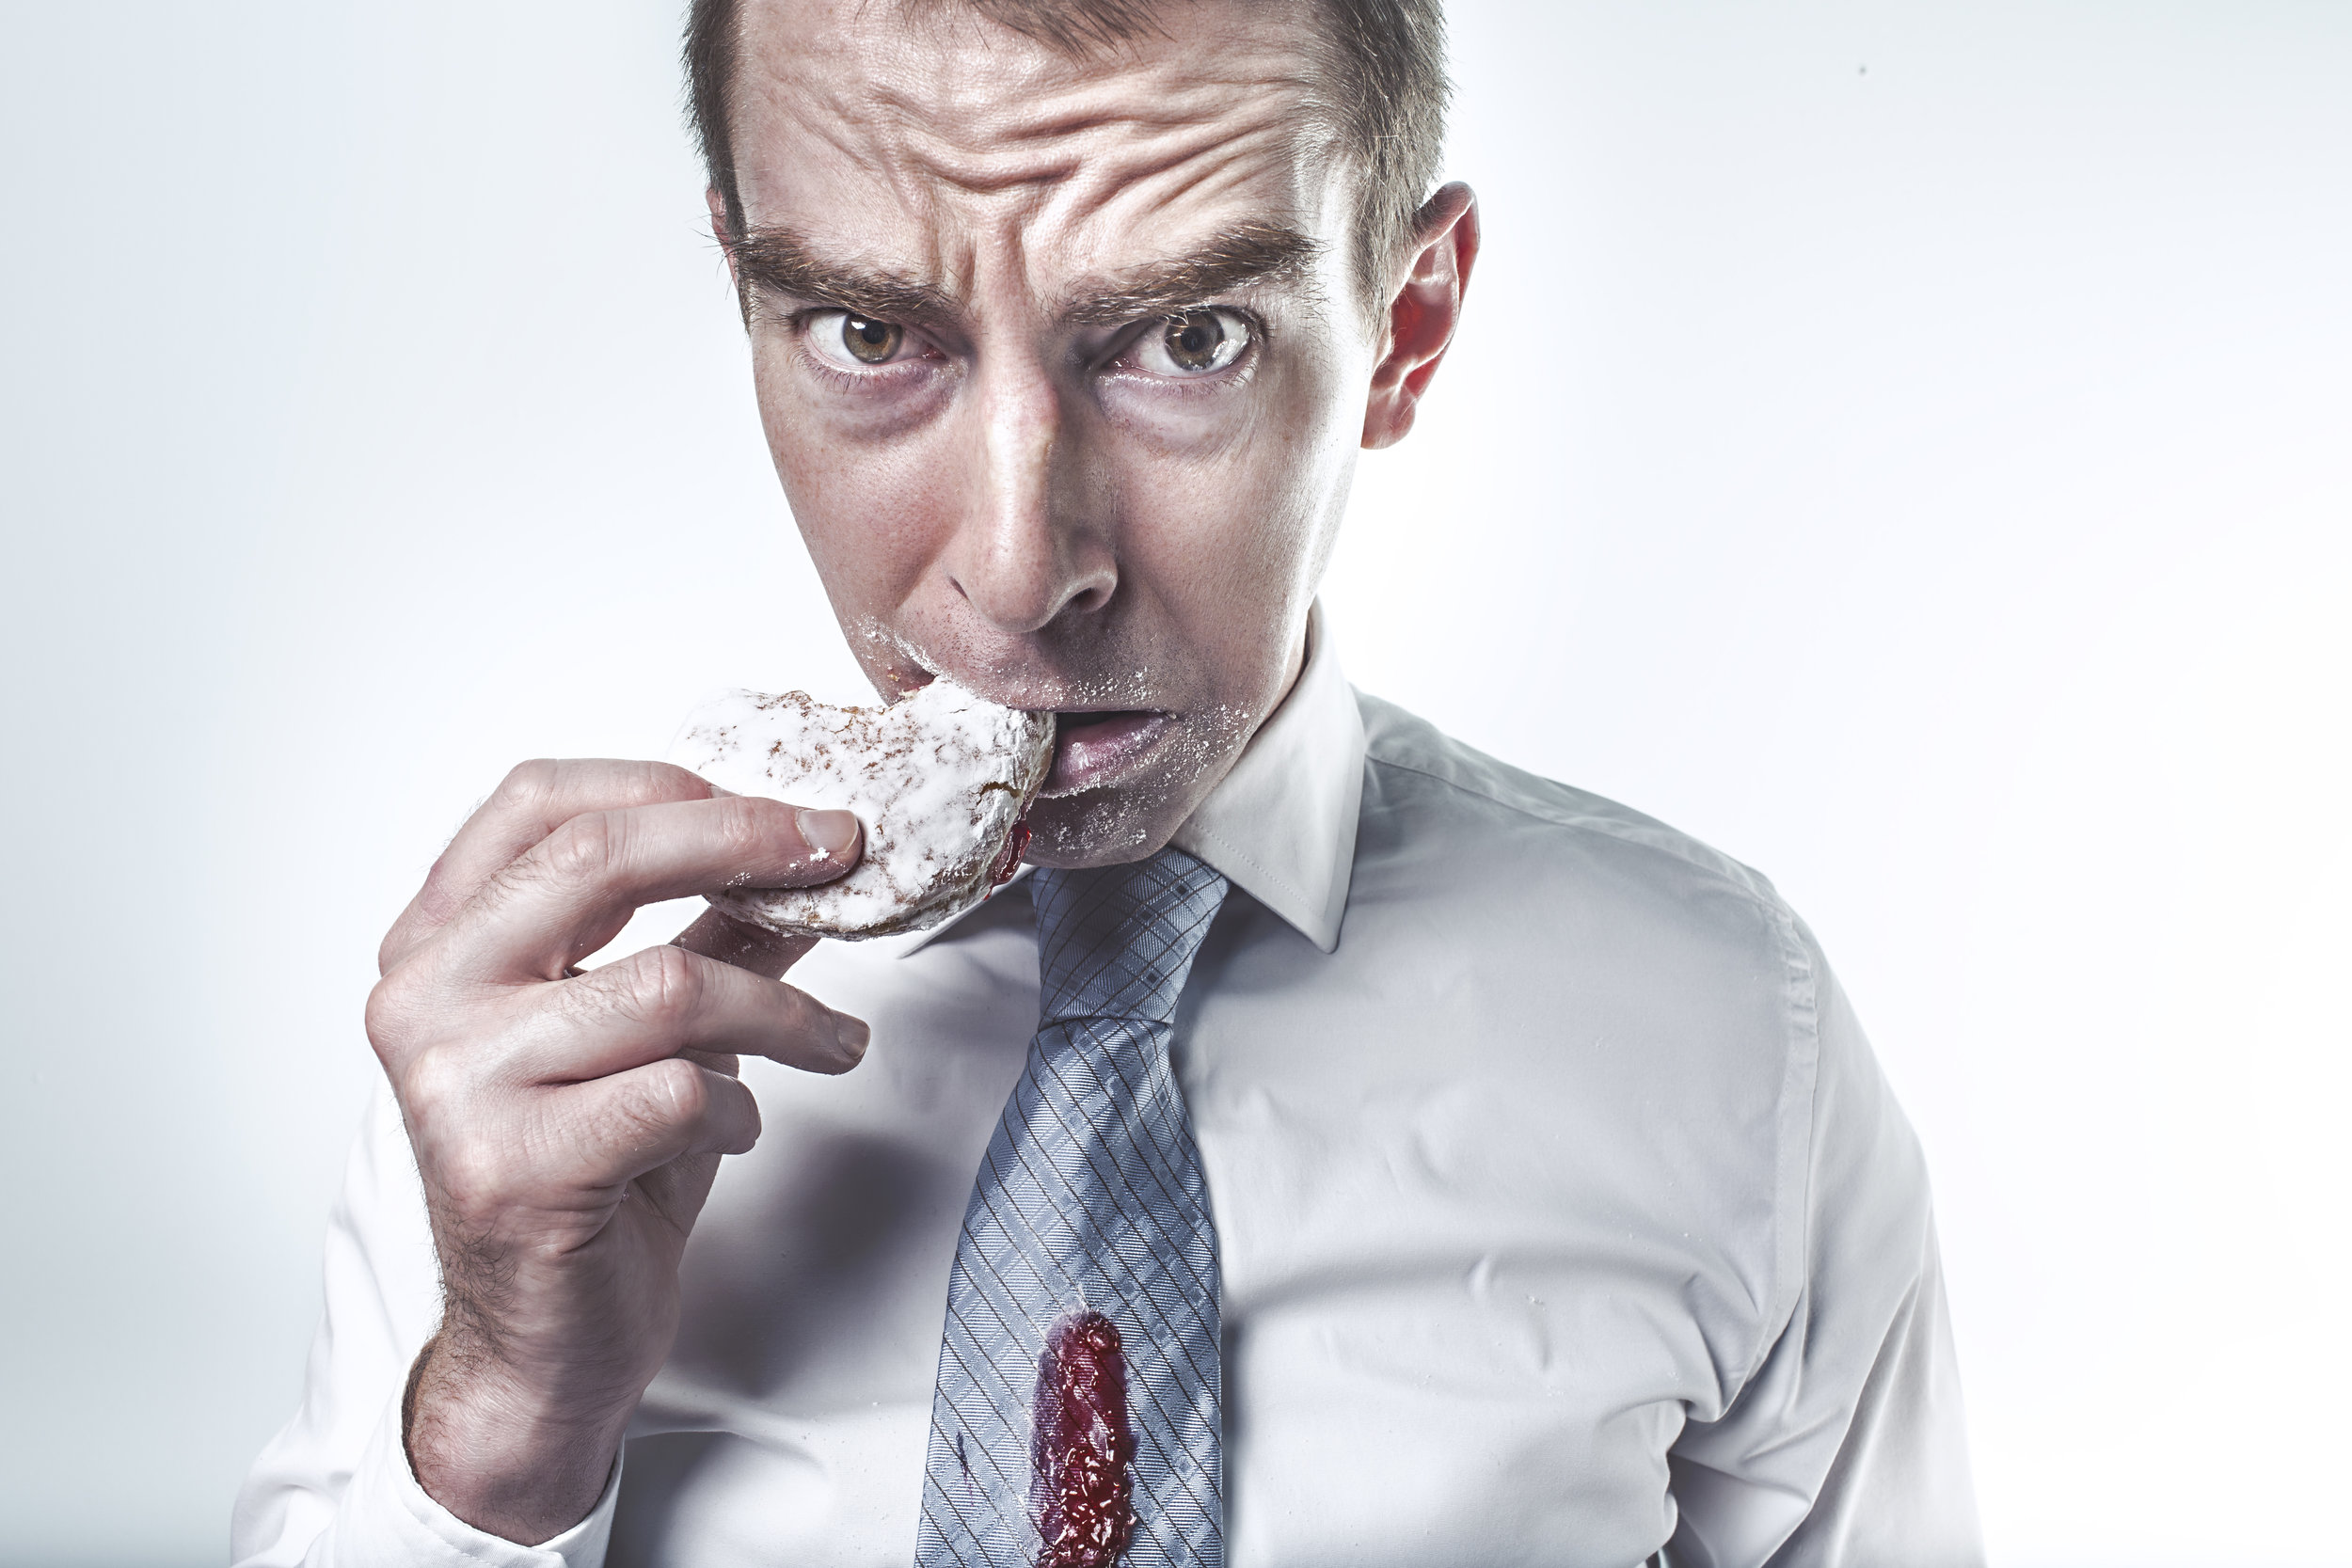 food-man-person-eating.jpg